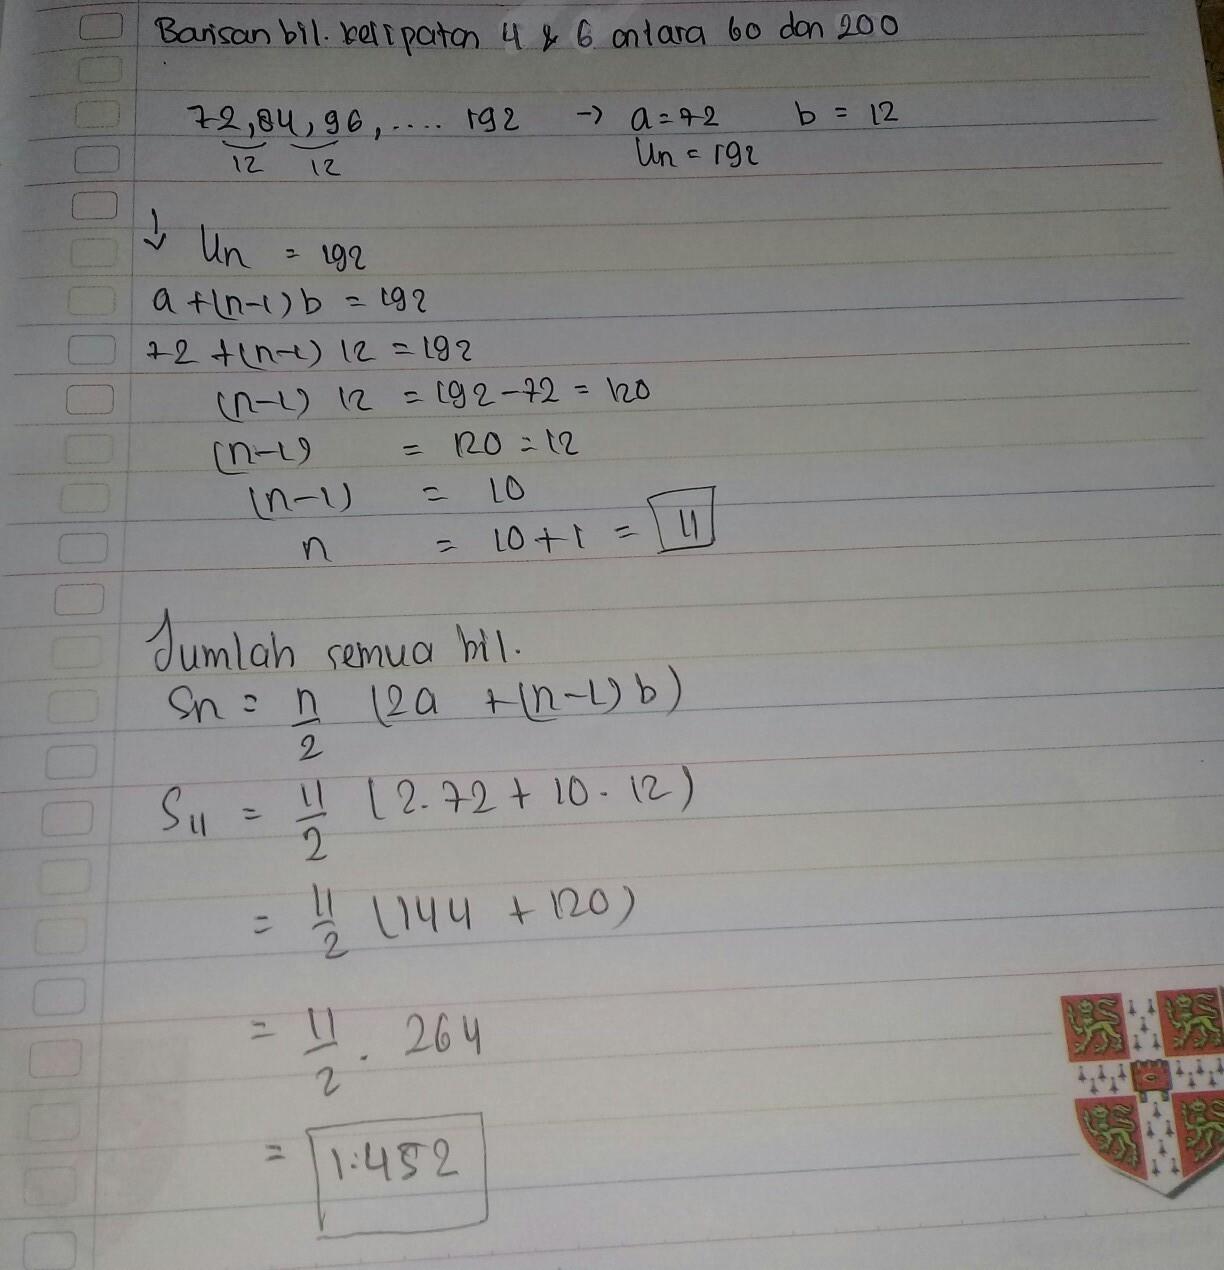 jumlah bilangan asli kelipatan 4 dan 6 antara 60 dan 200 ...